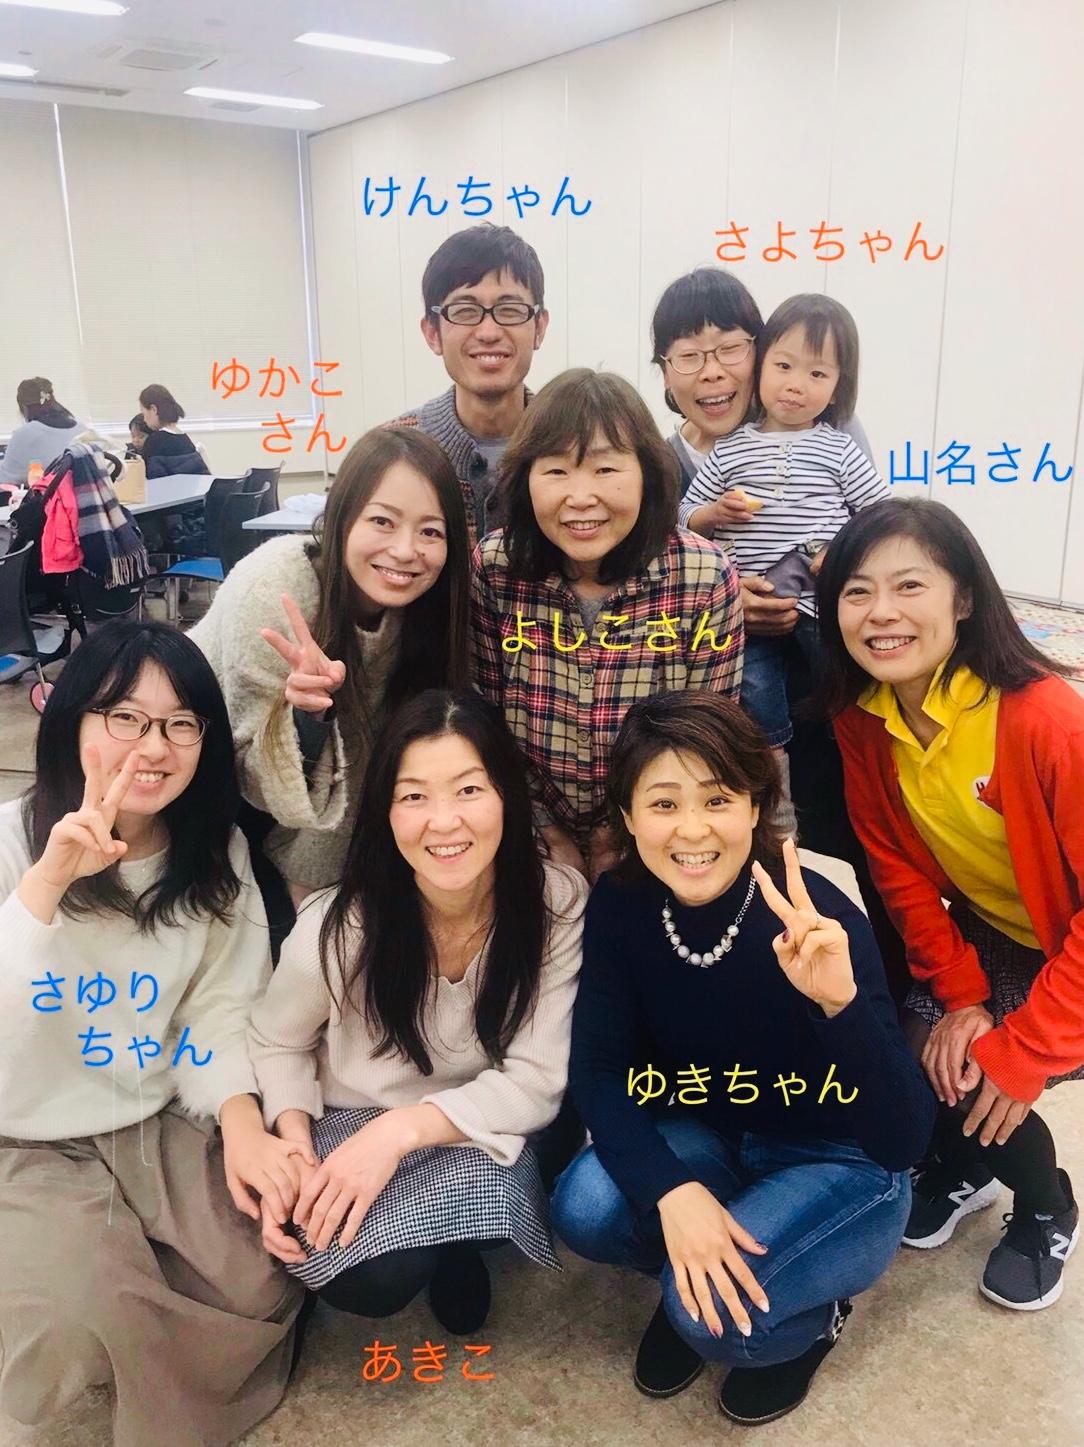 2020/1/28 1010HAPPY 藤沢クラスAグループ